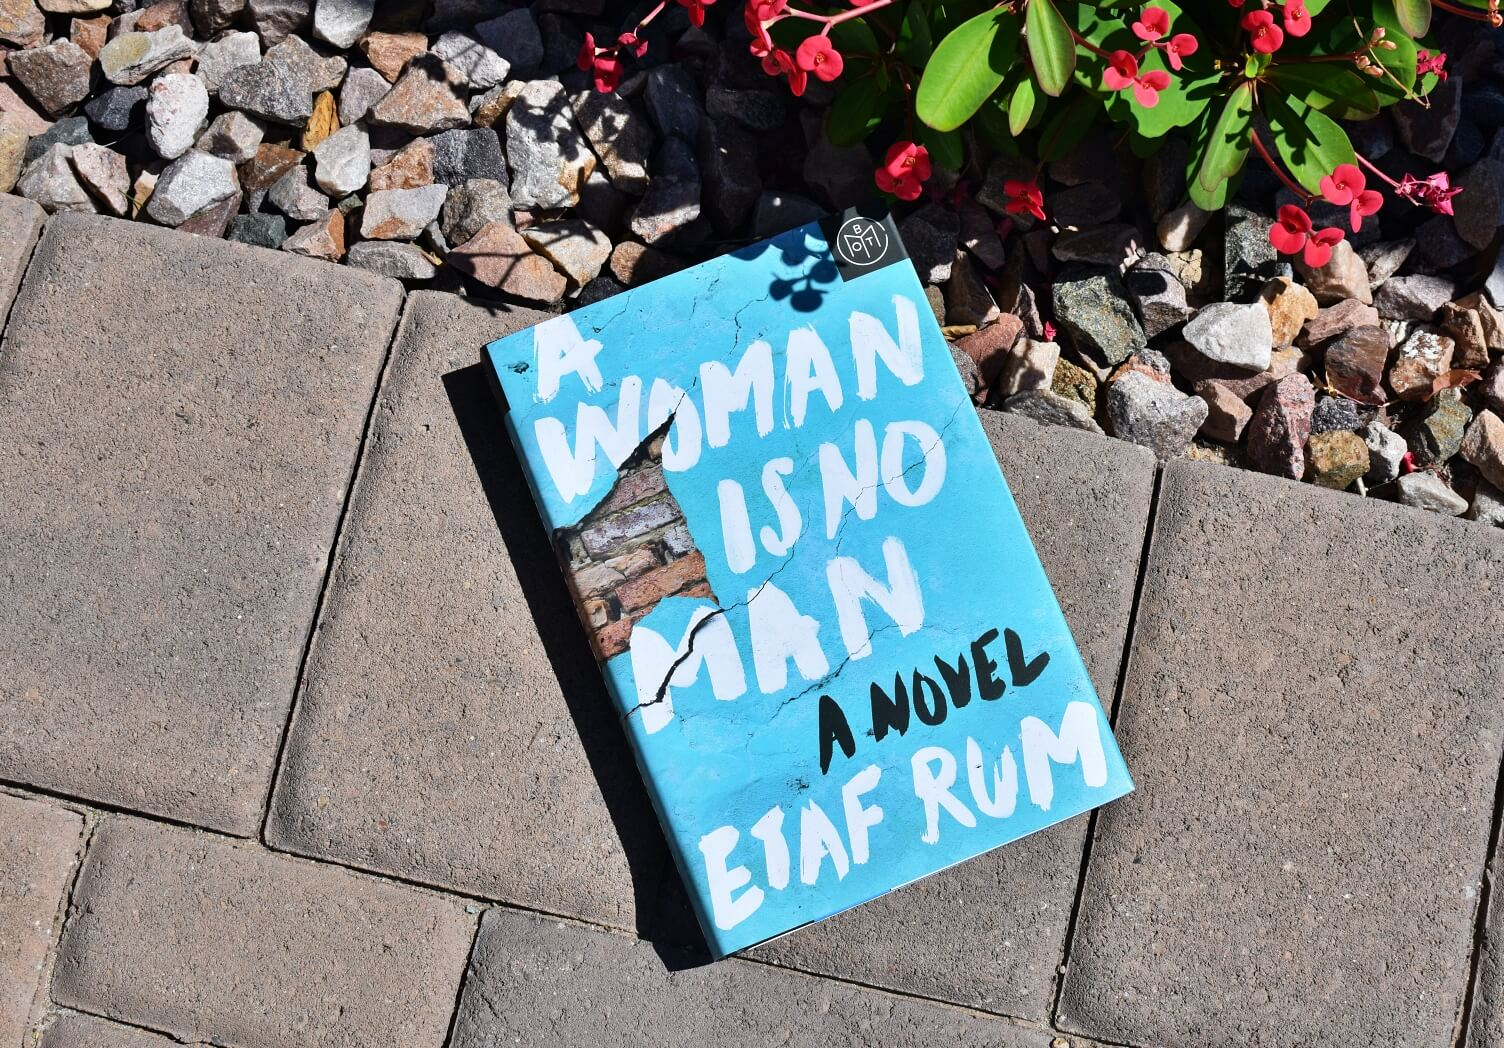 A Woman is No Man Etaf Rum Review - Book Club Chat